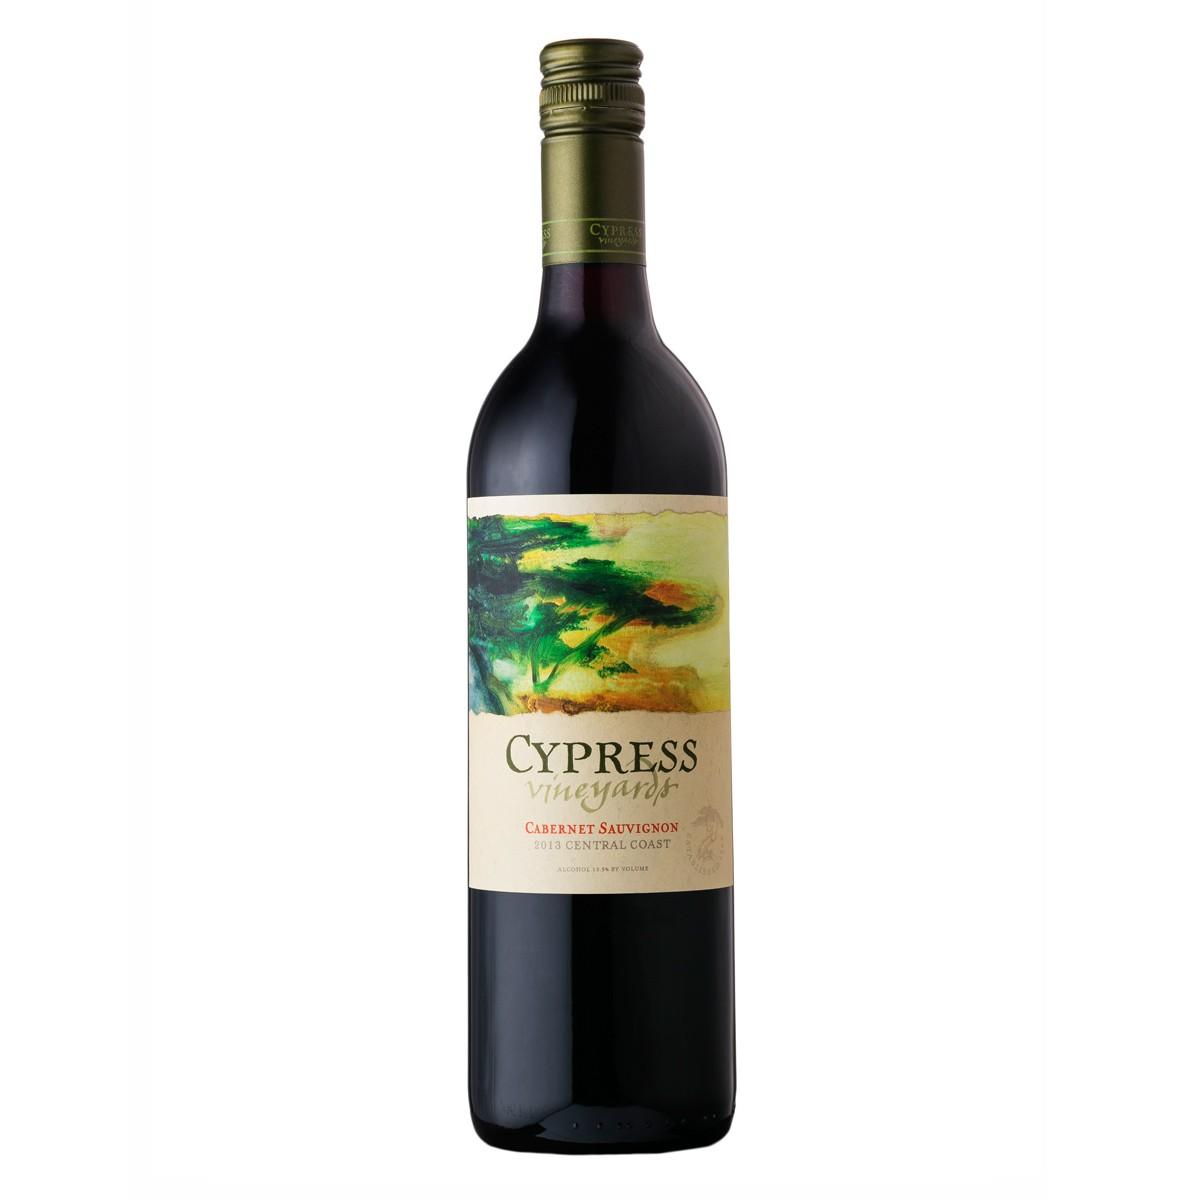 Cypress Cabernet Sauvignon